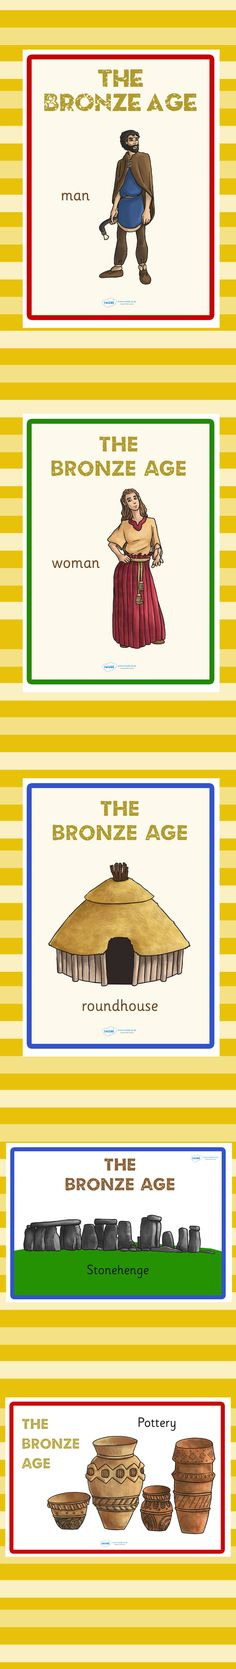 KS2 Bronze Age- Bronze Age Display Posters